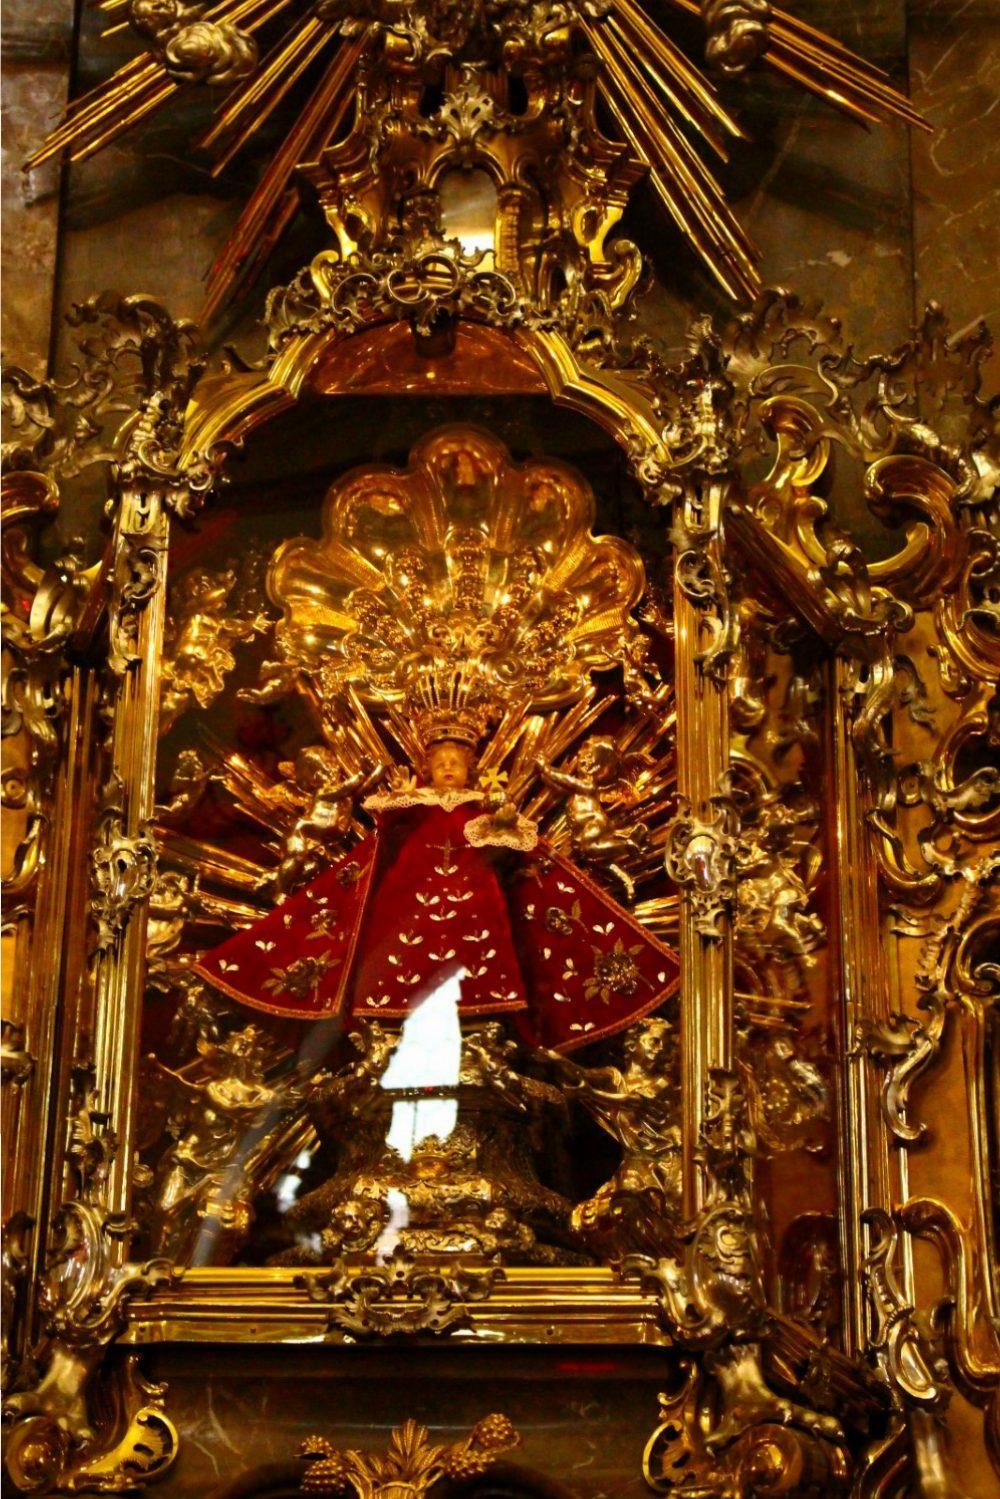 Imagen del Divino Niño de Praga (según una tradición perteneció a Santa Teresa de Ávila)